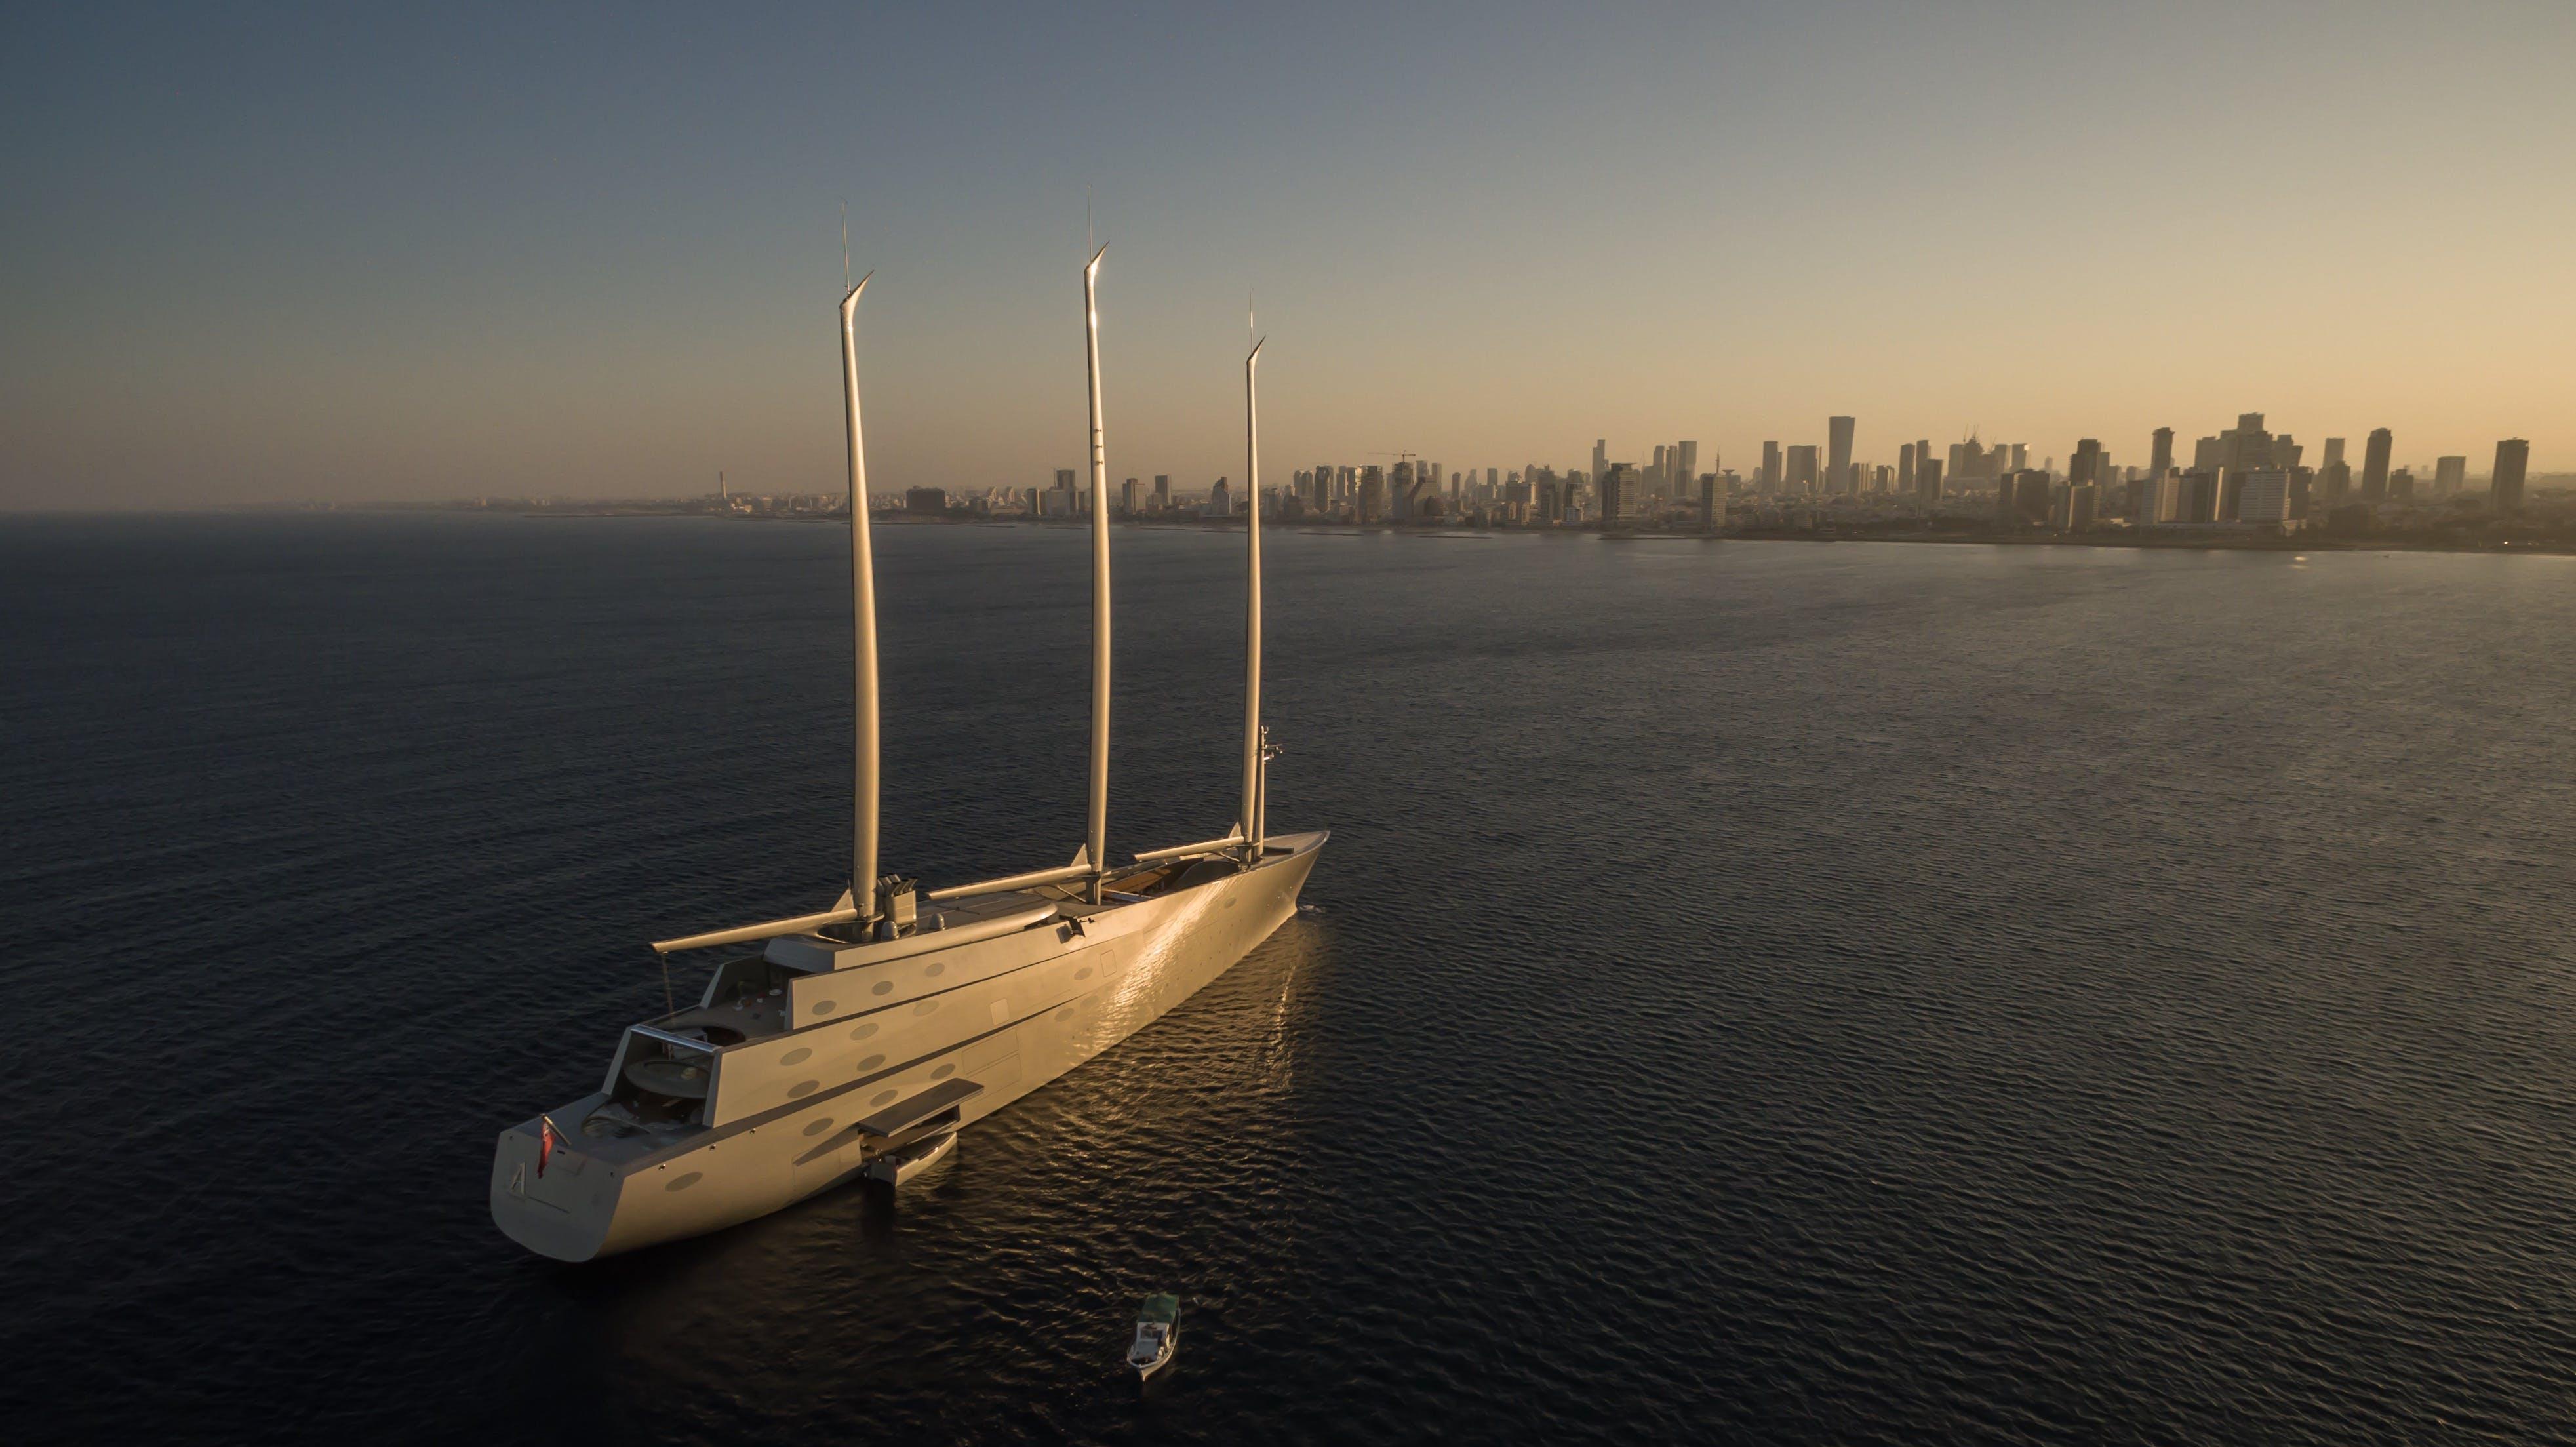 Free stock photo of Israel, ocean, yacht